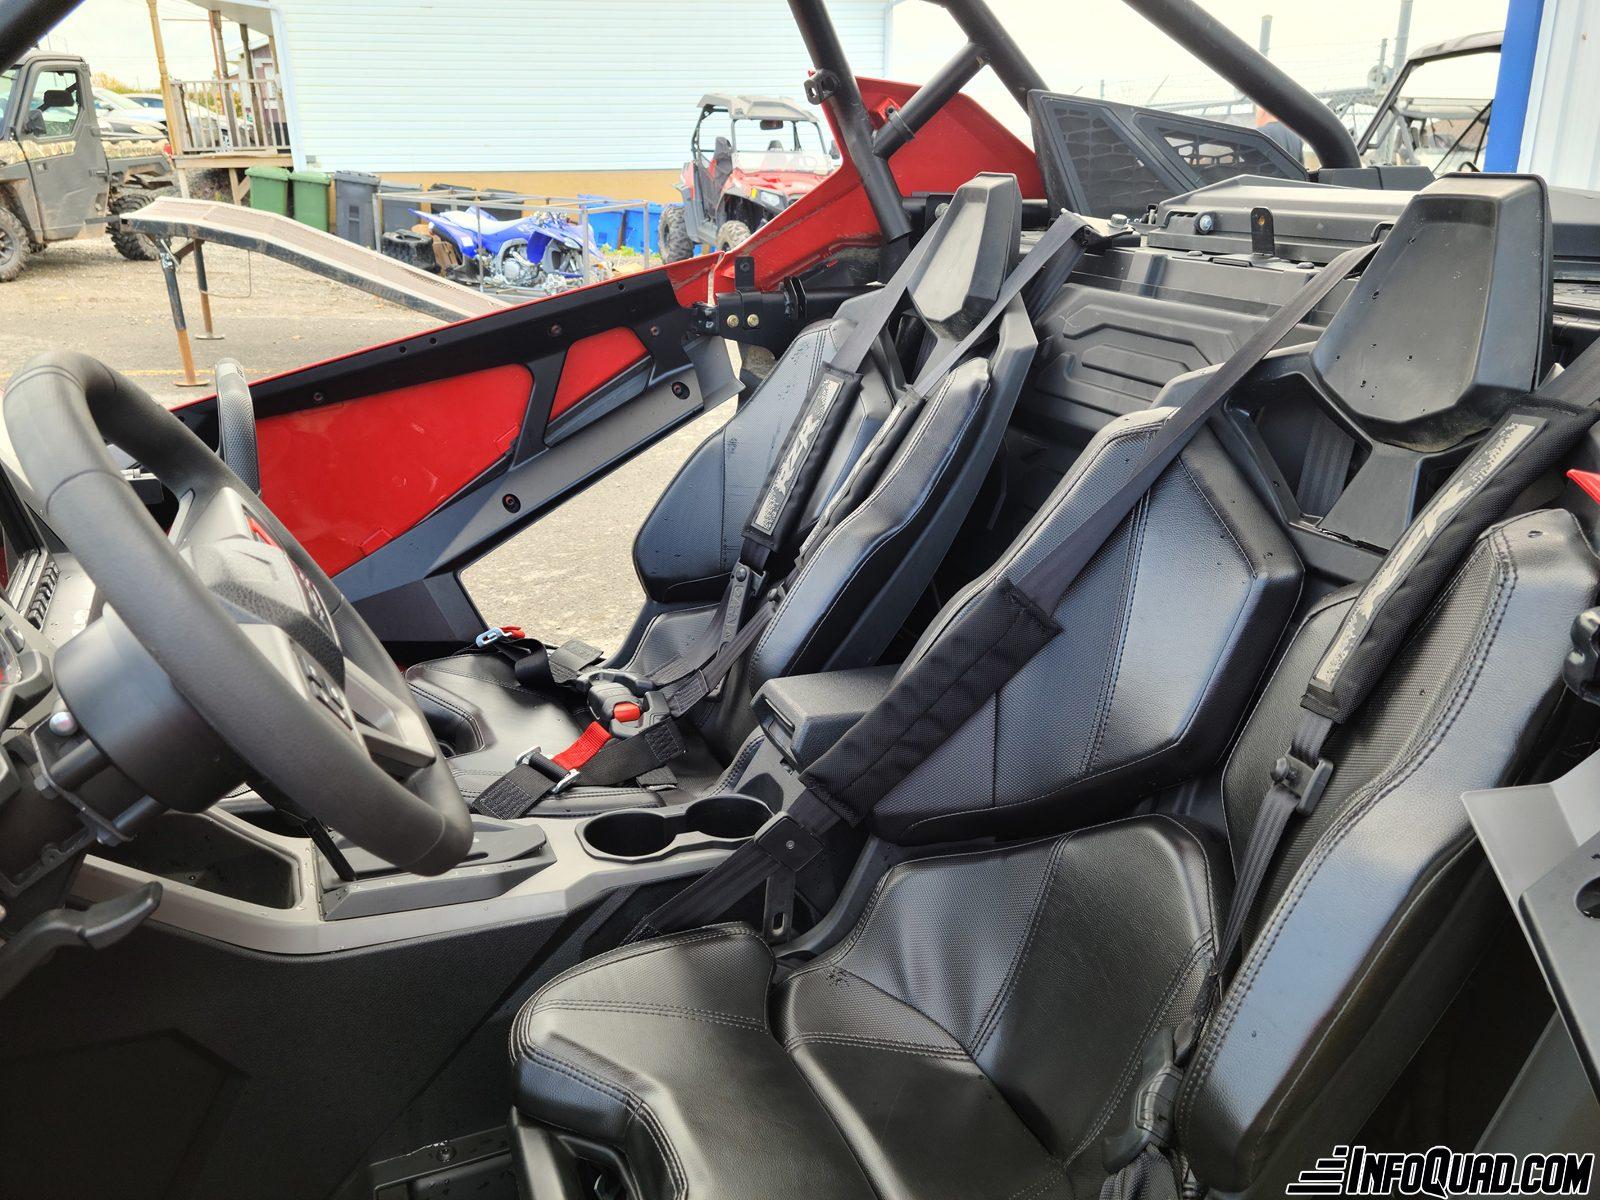 Polaris RZR XP Pro 1000 Turbo Ultimate Dynamix